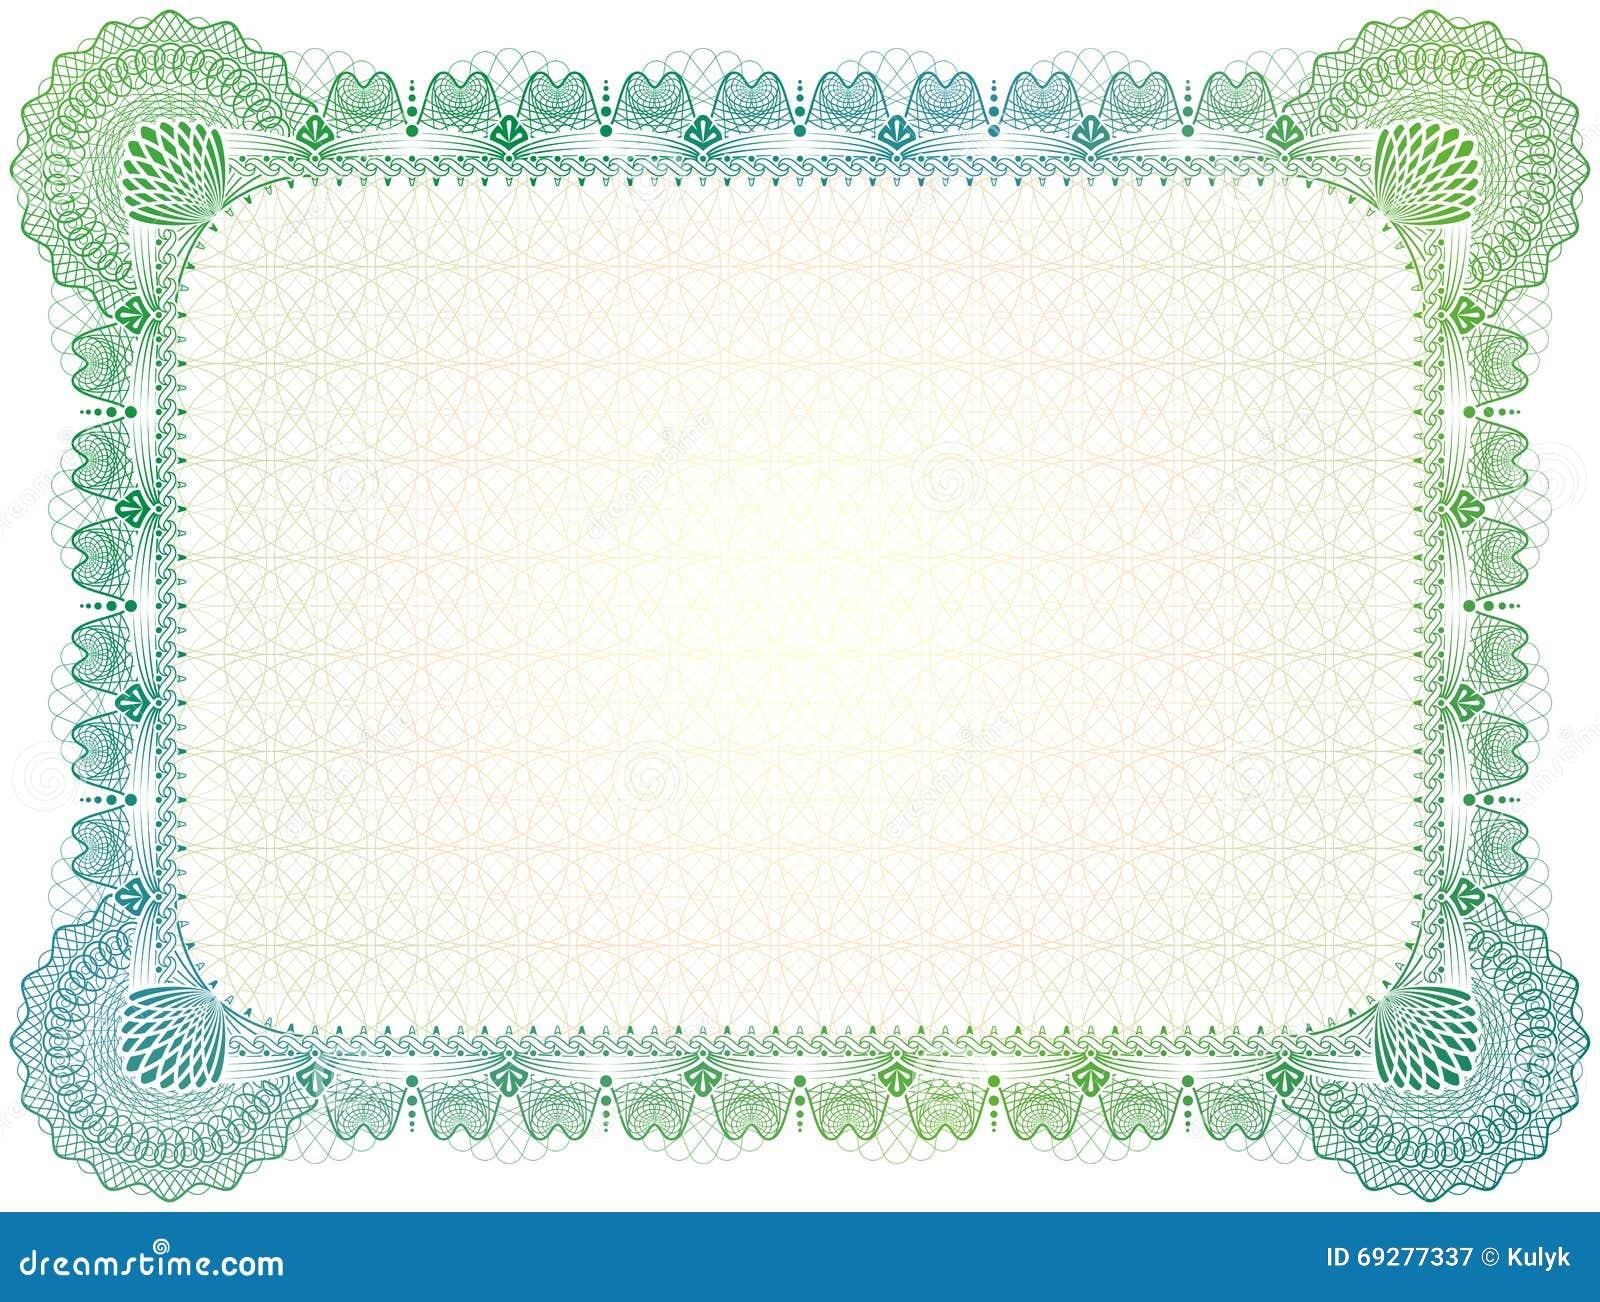 Green certificate border template carlosdelarosavidal birth certificate template for girl green certificate border template 1betcityfo Image collections